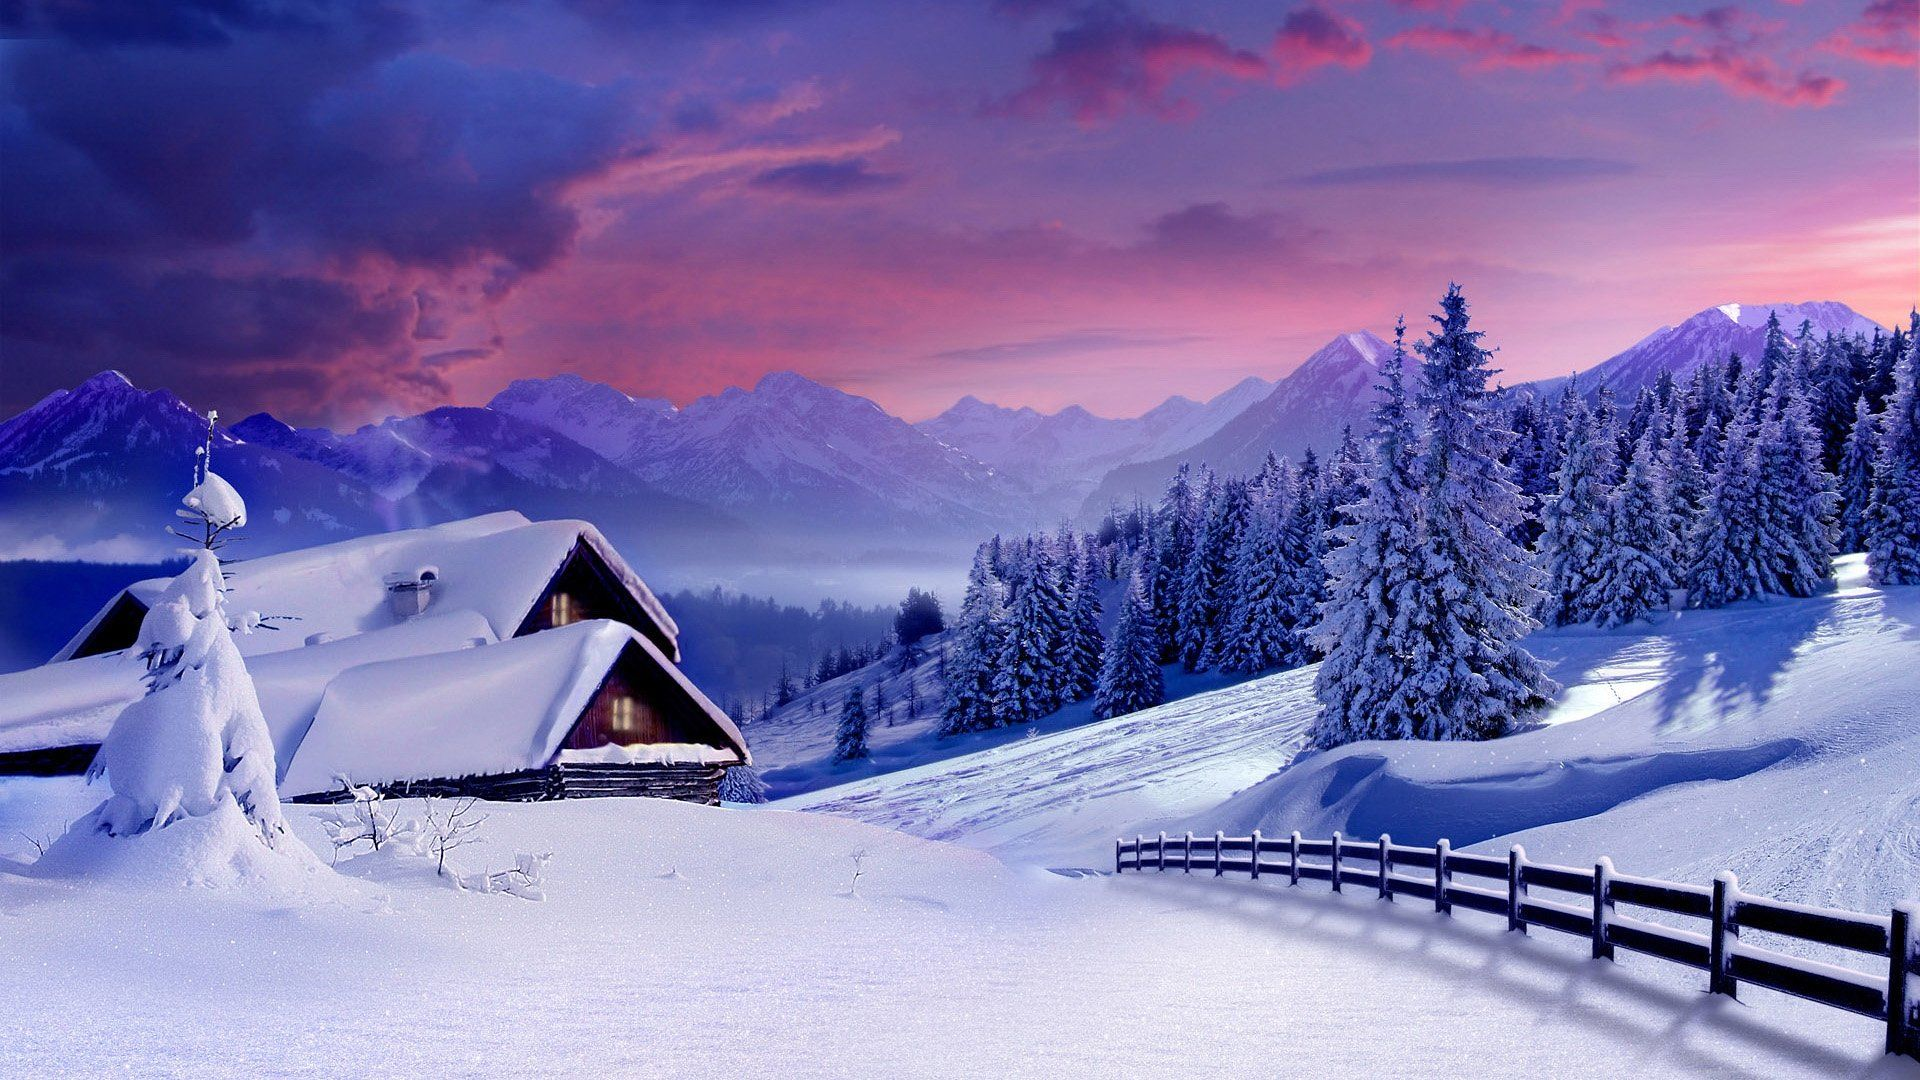 Free Holiday image